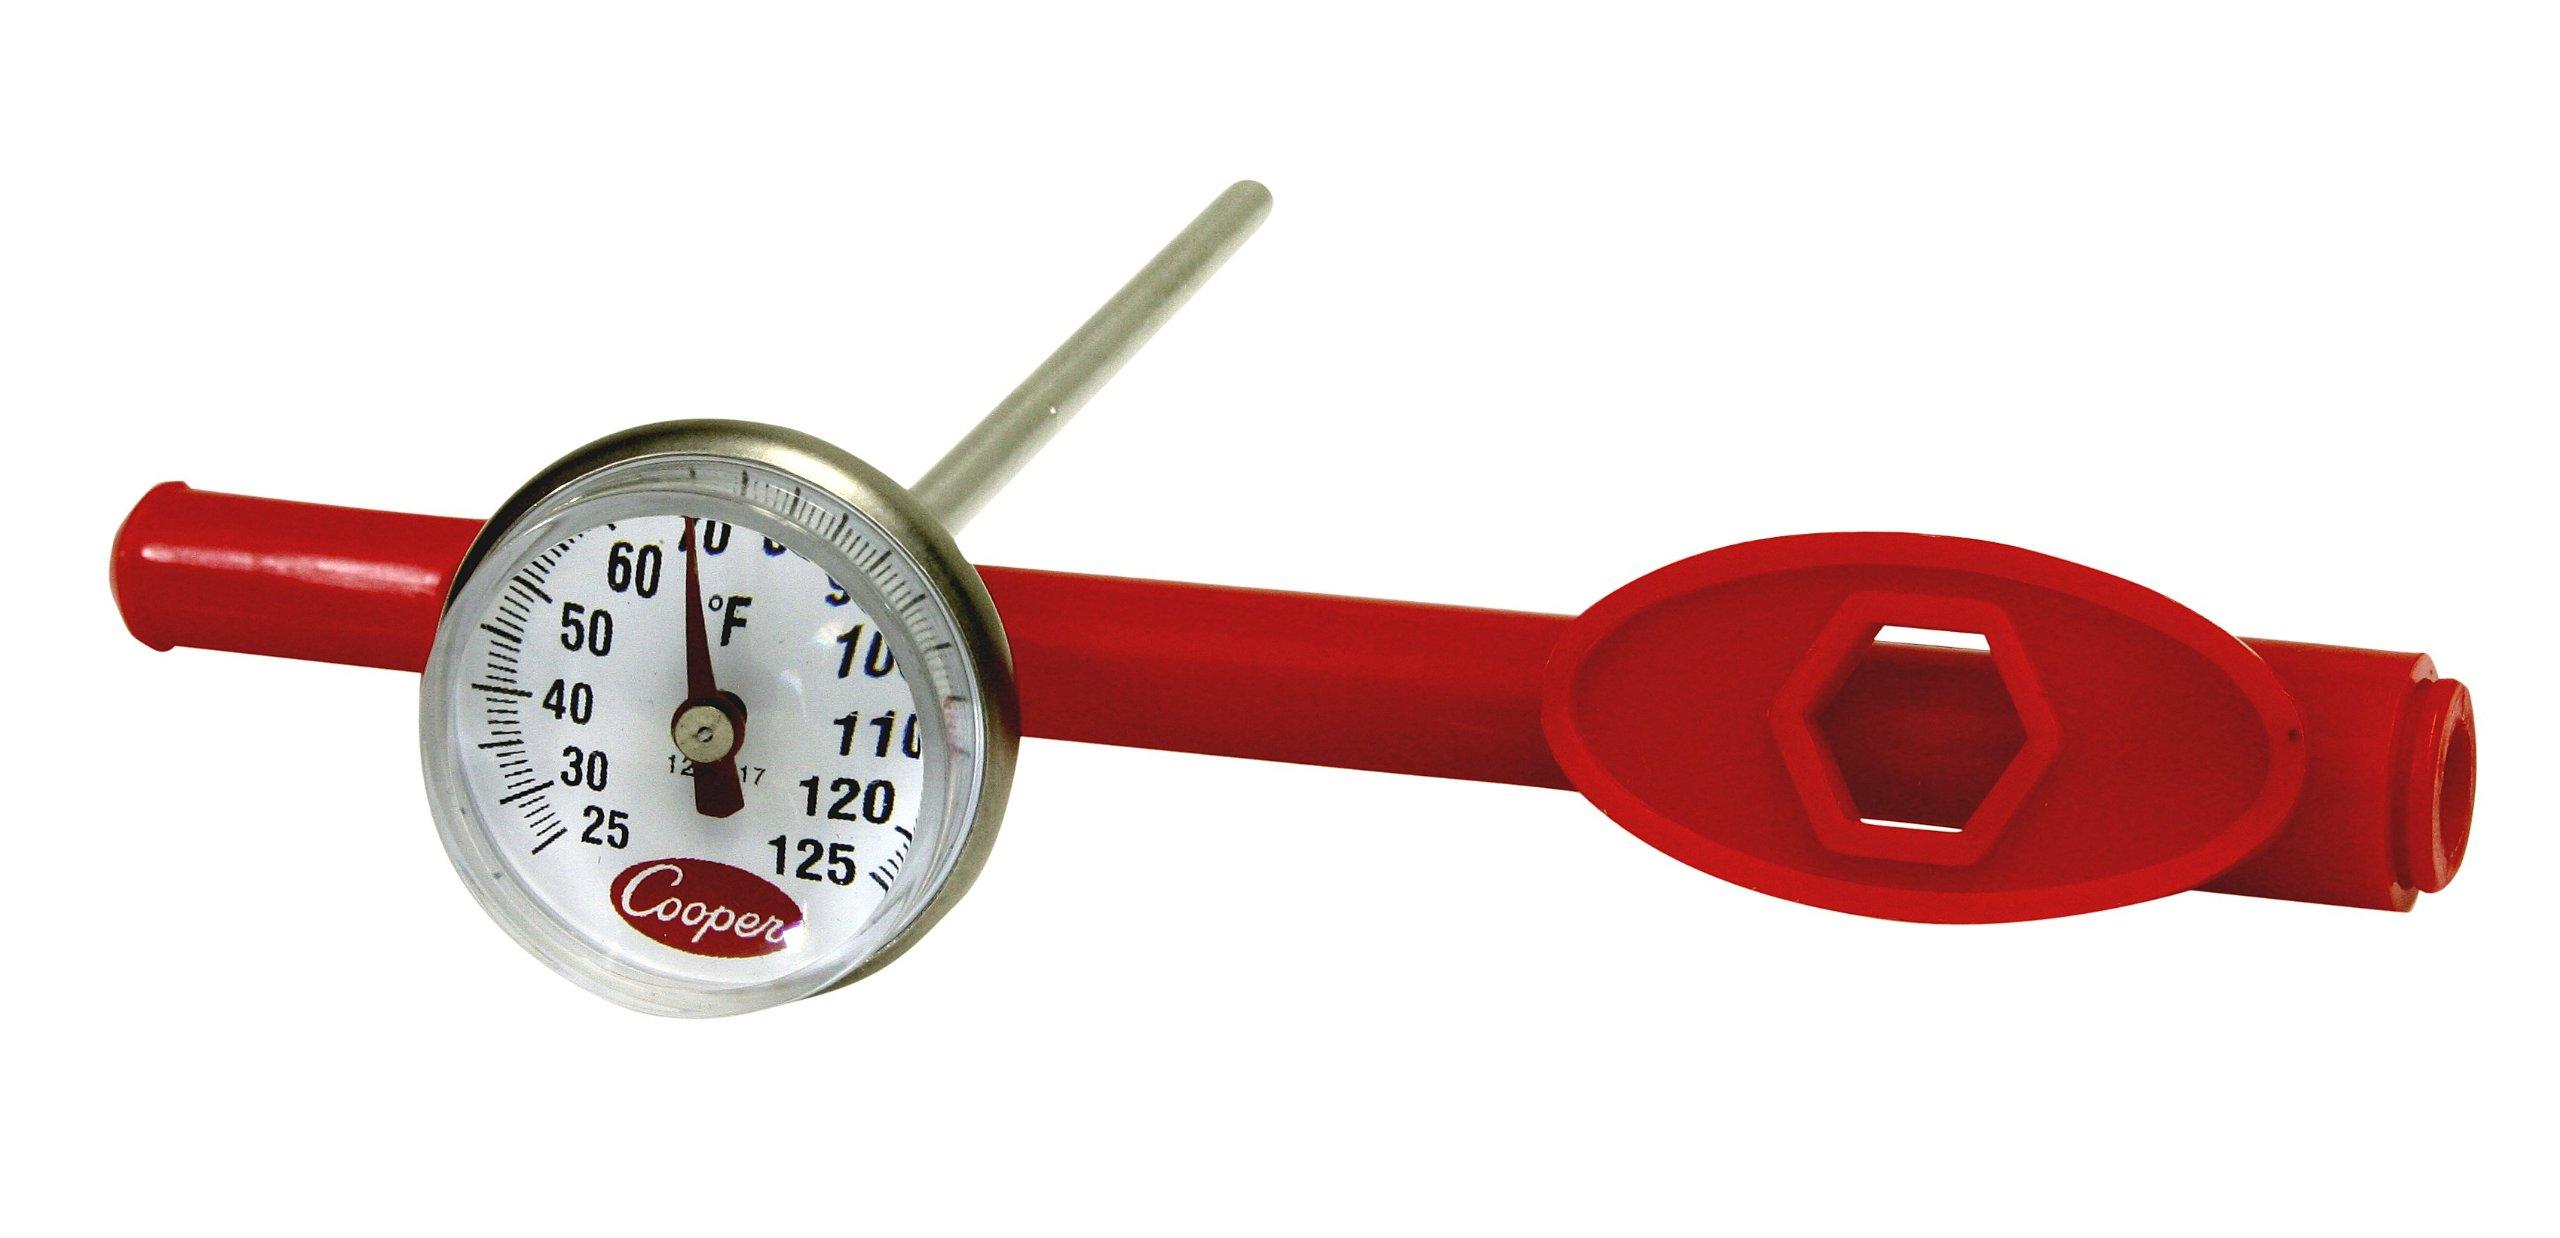 Cooper-Atkins 1236-17-1 Bi-Metal Pocket Test Thermometer with Adjustment Sheath, 25/125°F Temperature Range